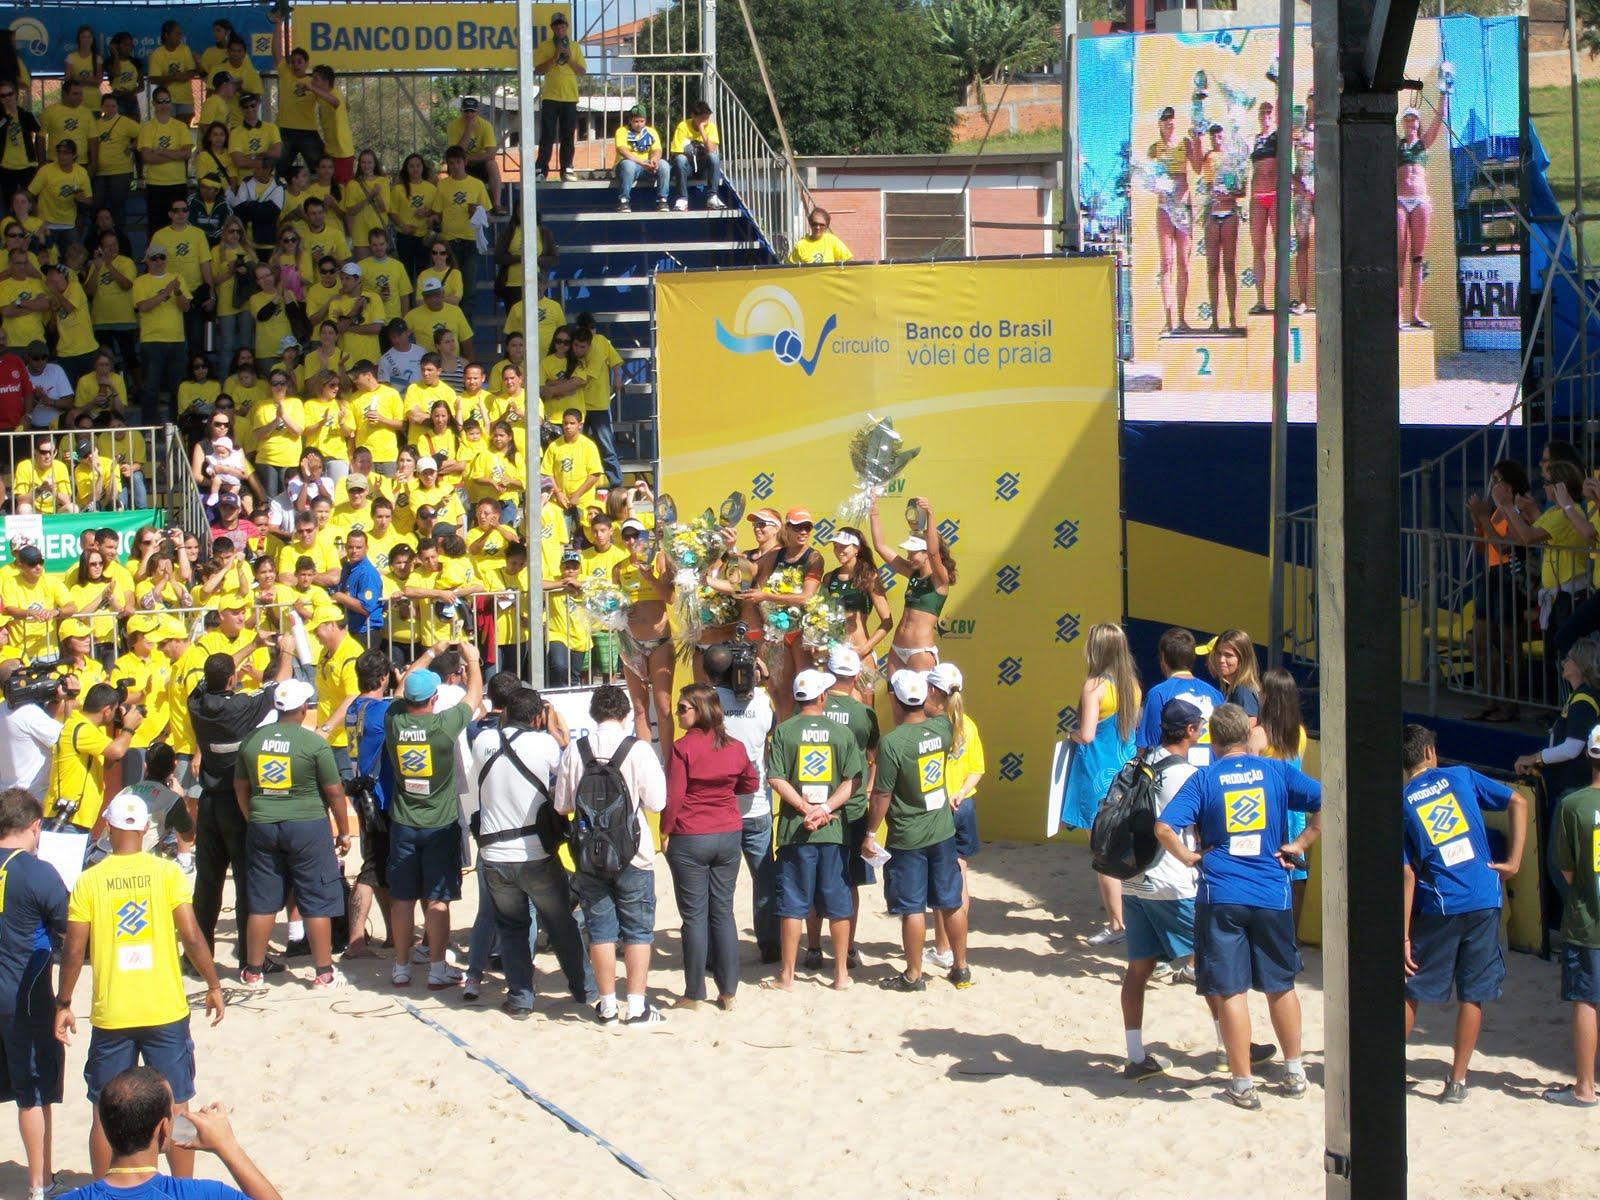 Circuito Banco Do Brasil : Professor dida circuito banco do brasil de vÔlei